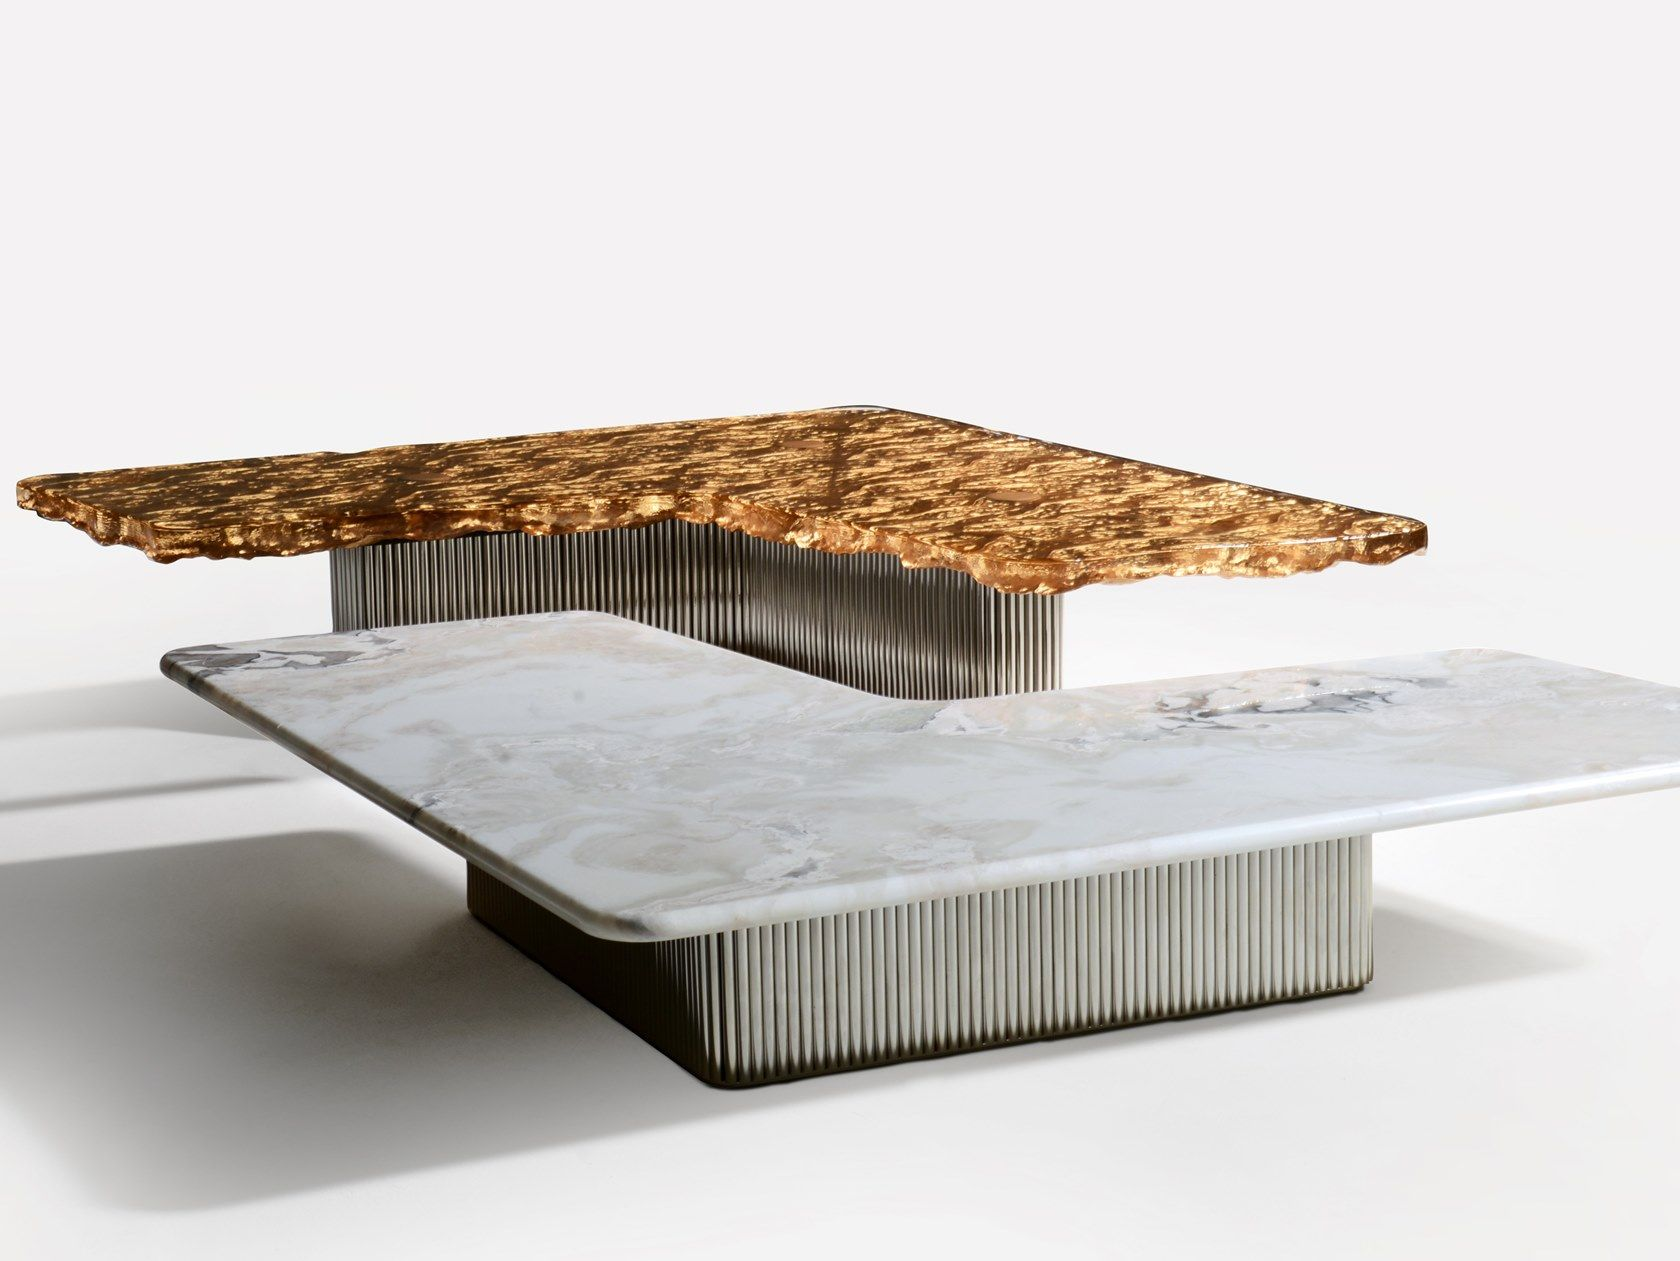 Hessentia Cornelio Cappellini Luxury Italian Furniture Archiproducts Coffee Table Furniture Design Coffee Table Design Coffee Table [ 1261 x 1680 Pixel ]